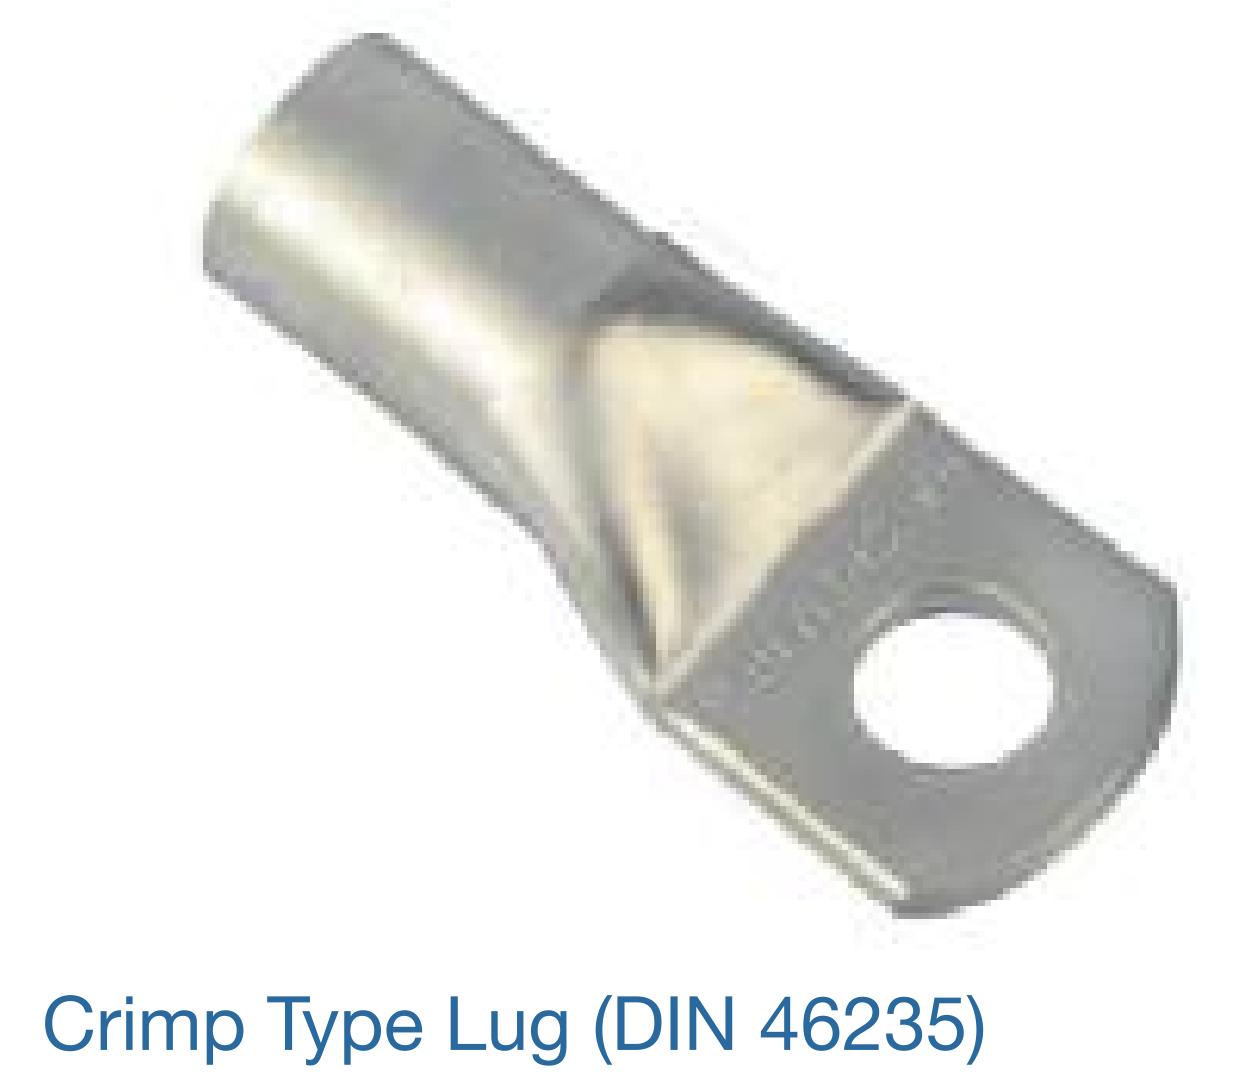 CRIMP TYPE ( AS PER DIN 46235 )